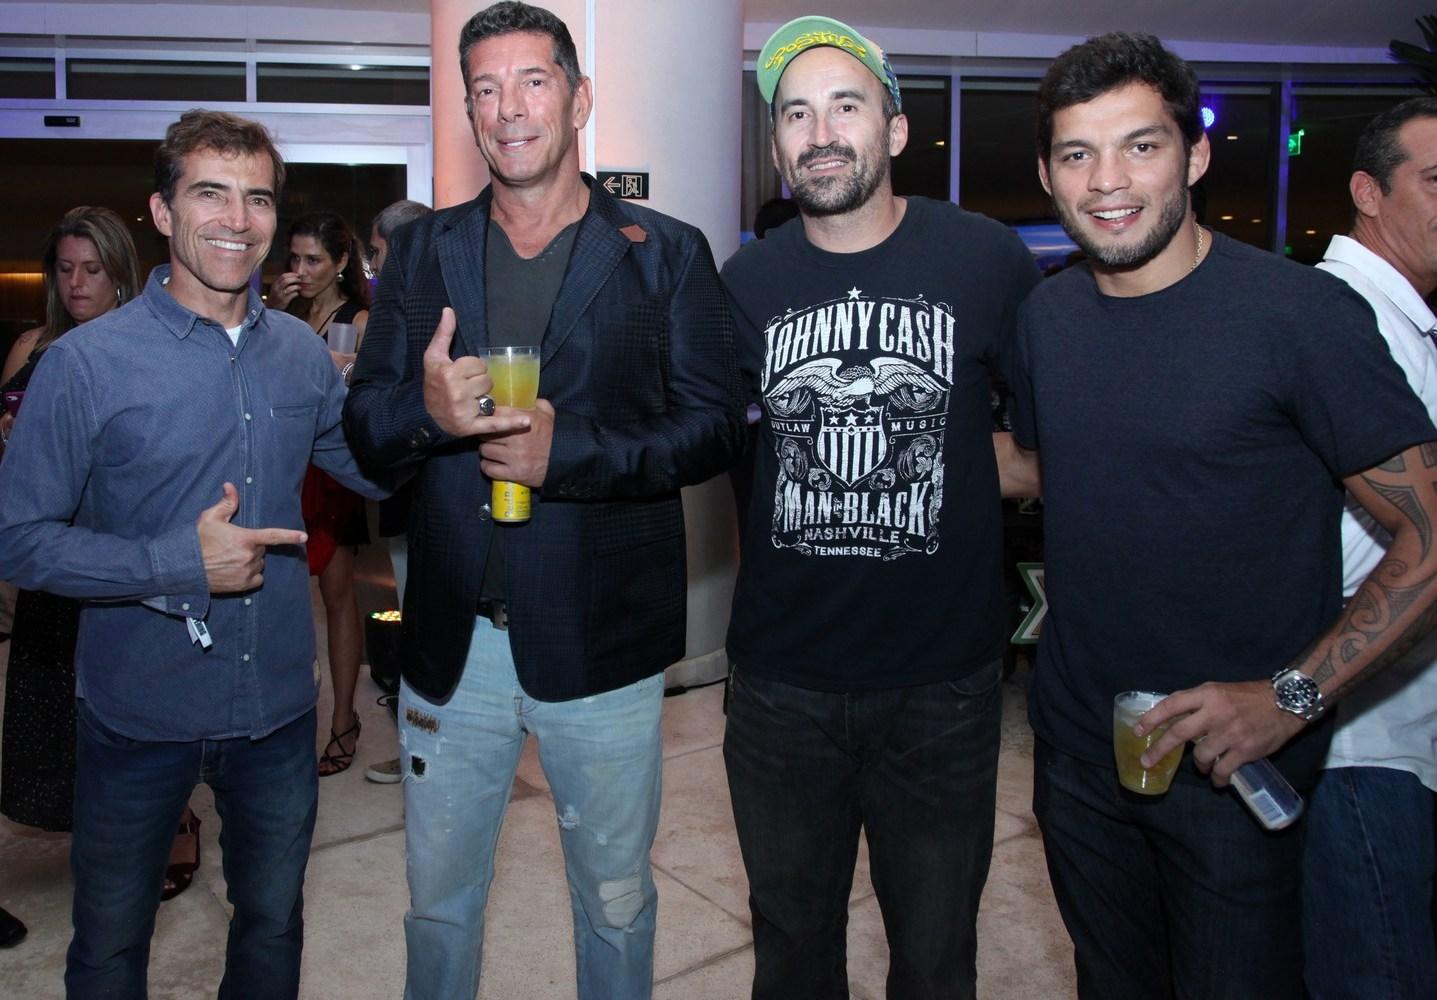 Carlos Burle, Julio Pignatari e Gui Padua e Miltinho /Foto: Vera Donato